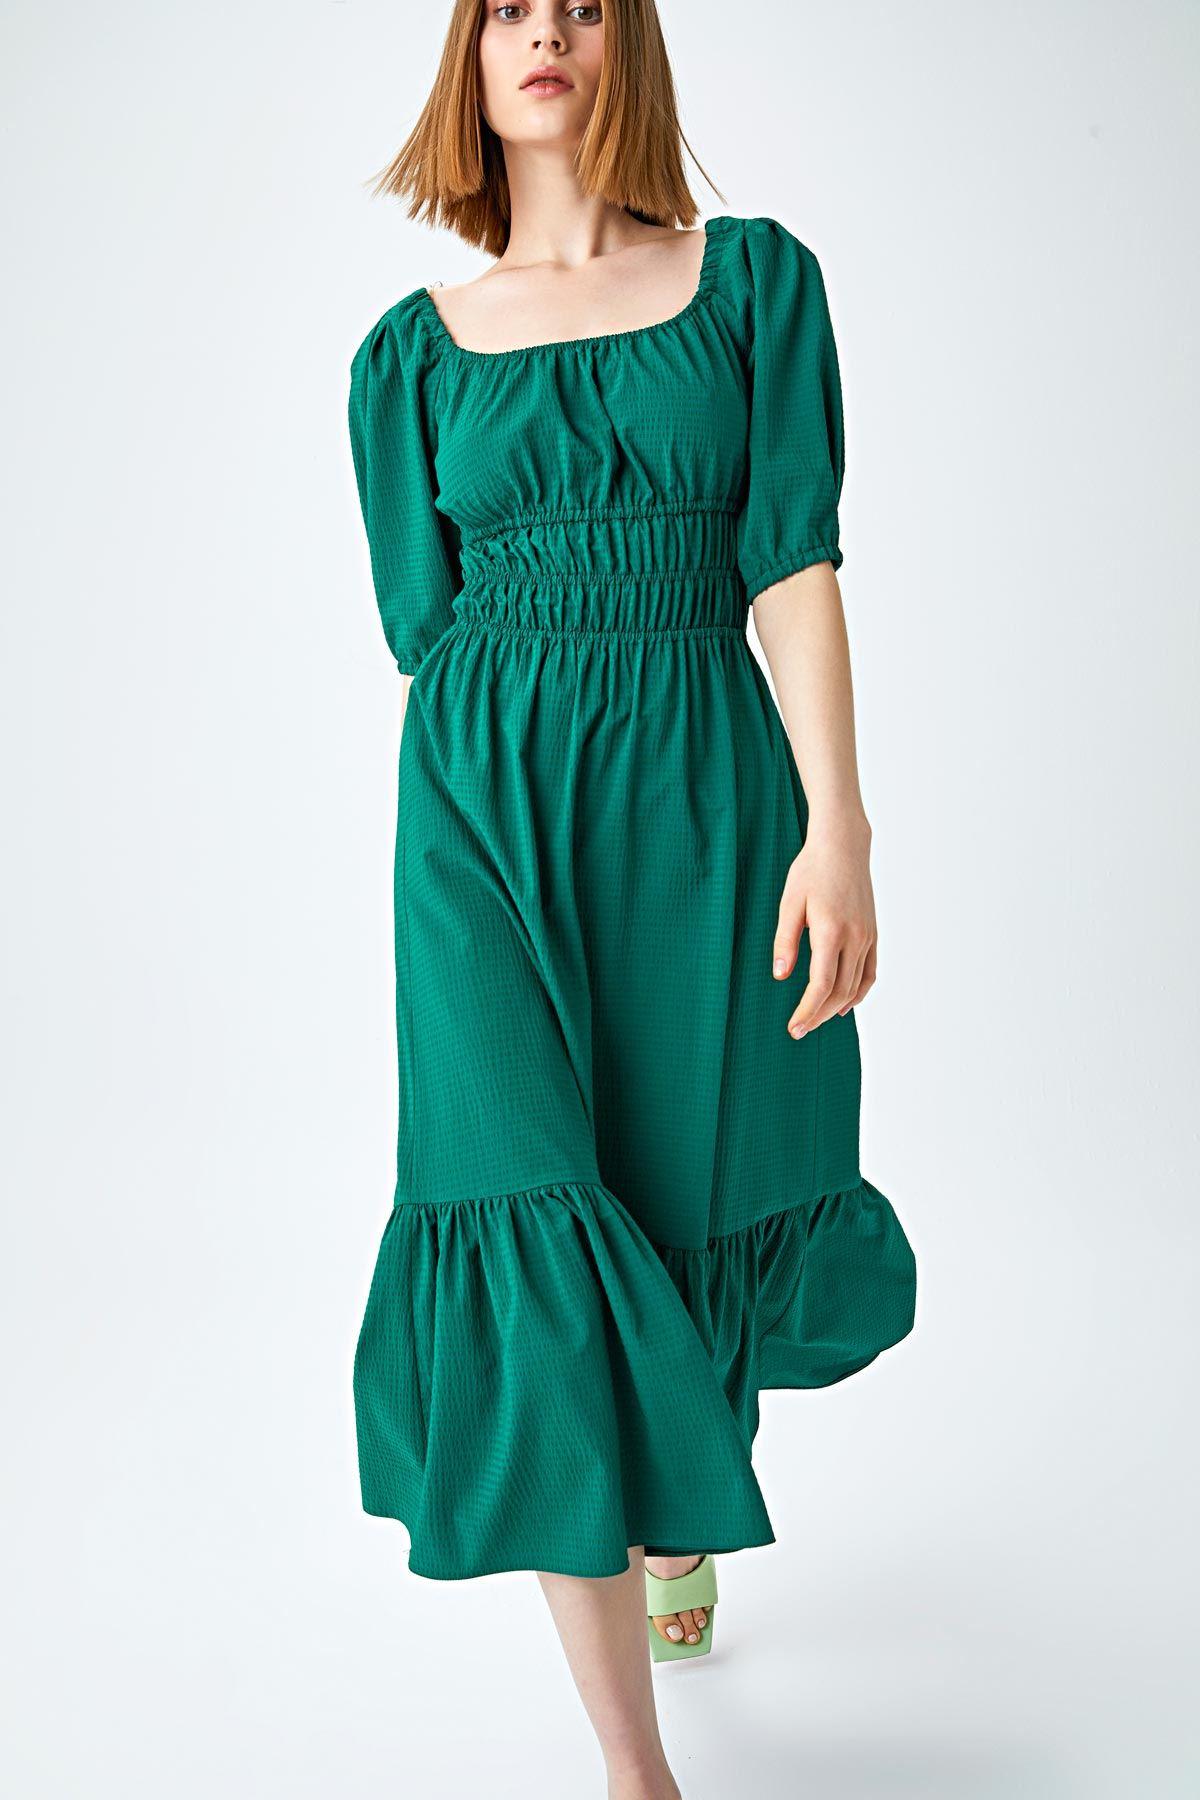 Bel vurgulu kare yaka elbise Nefti Yeşili